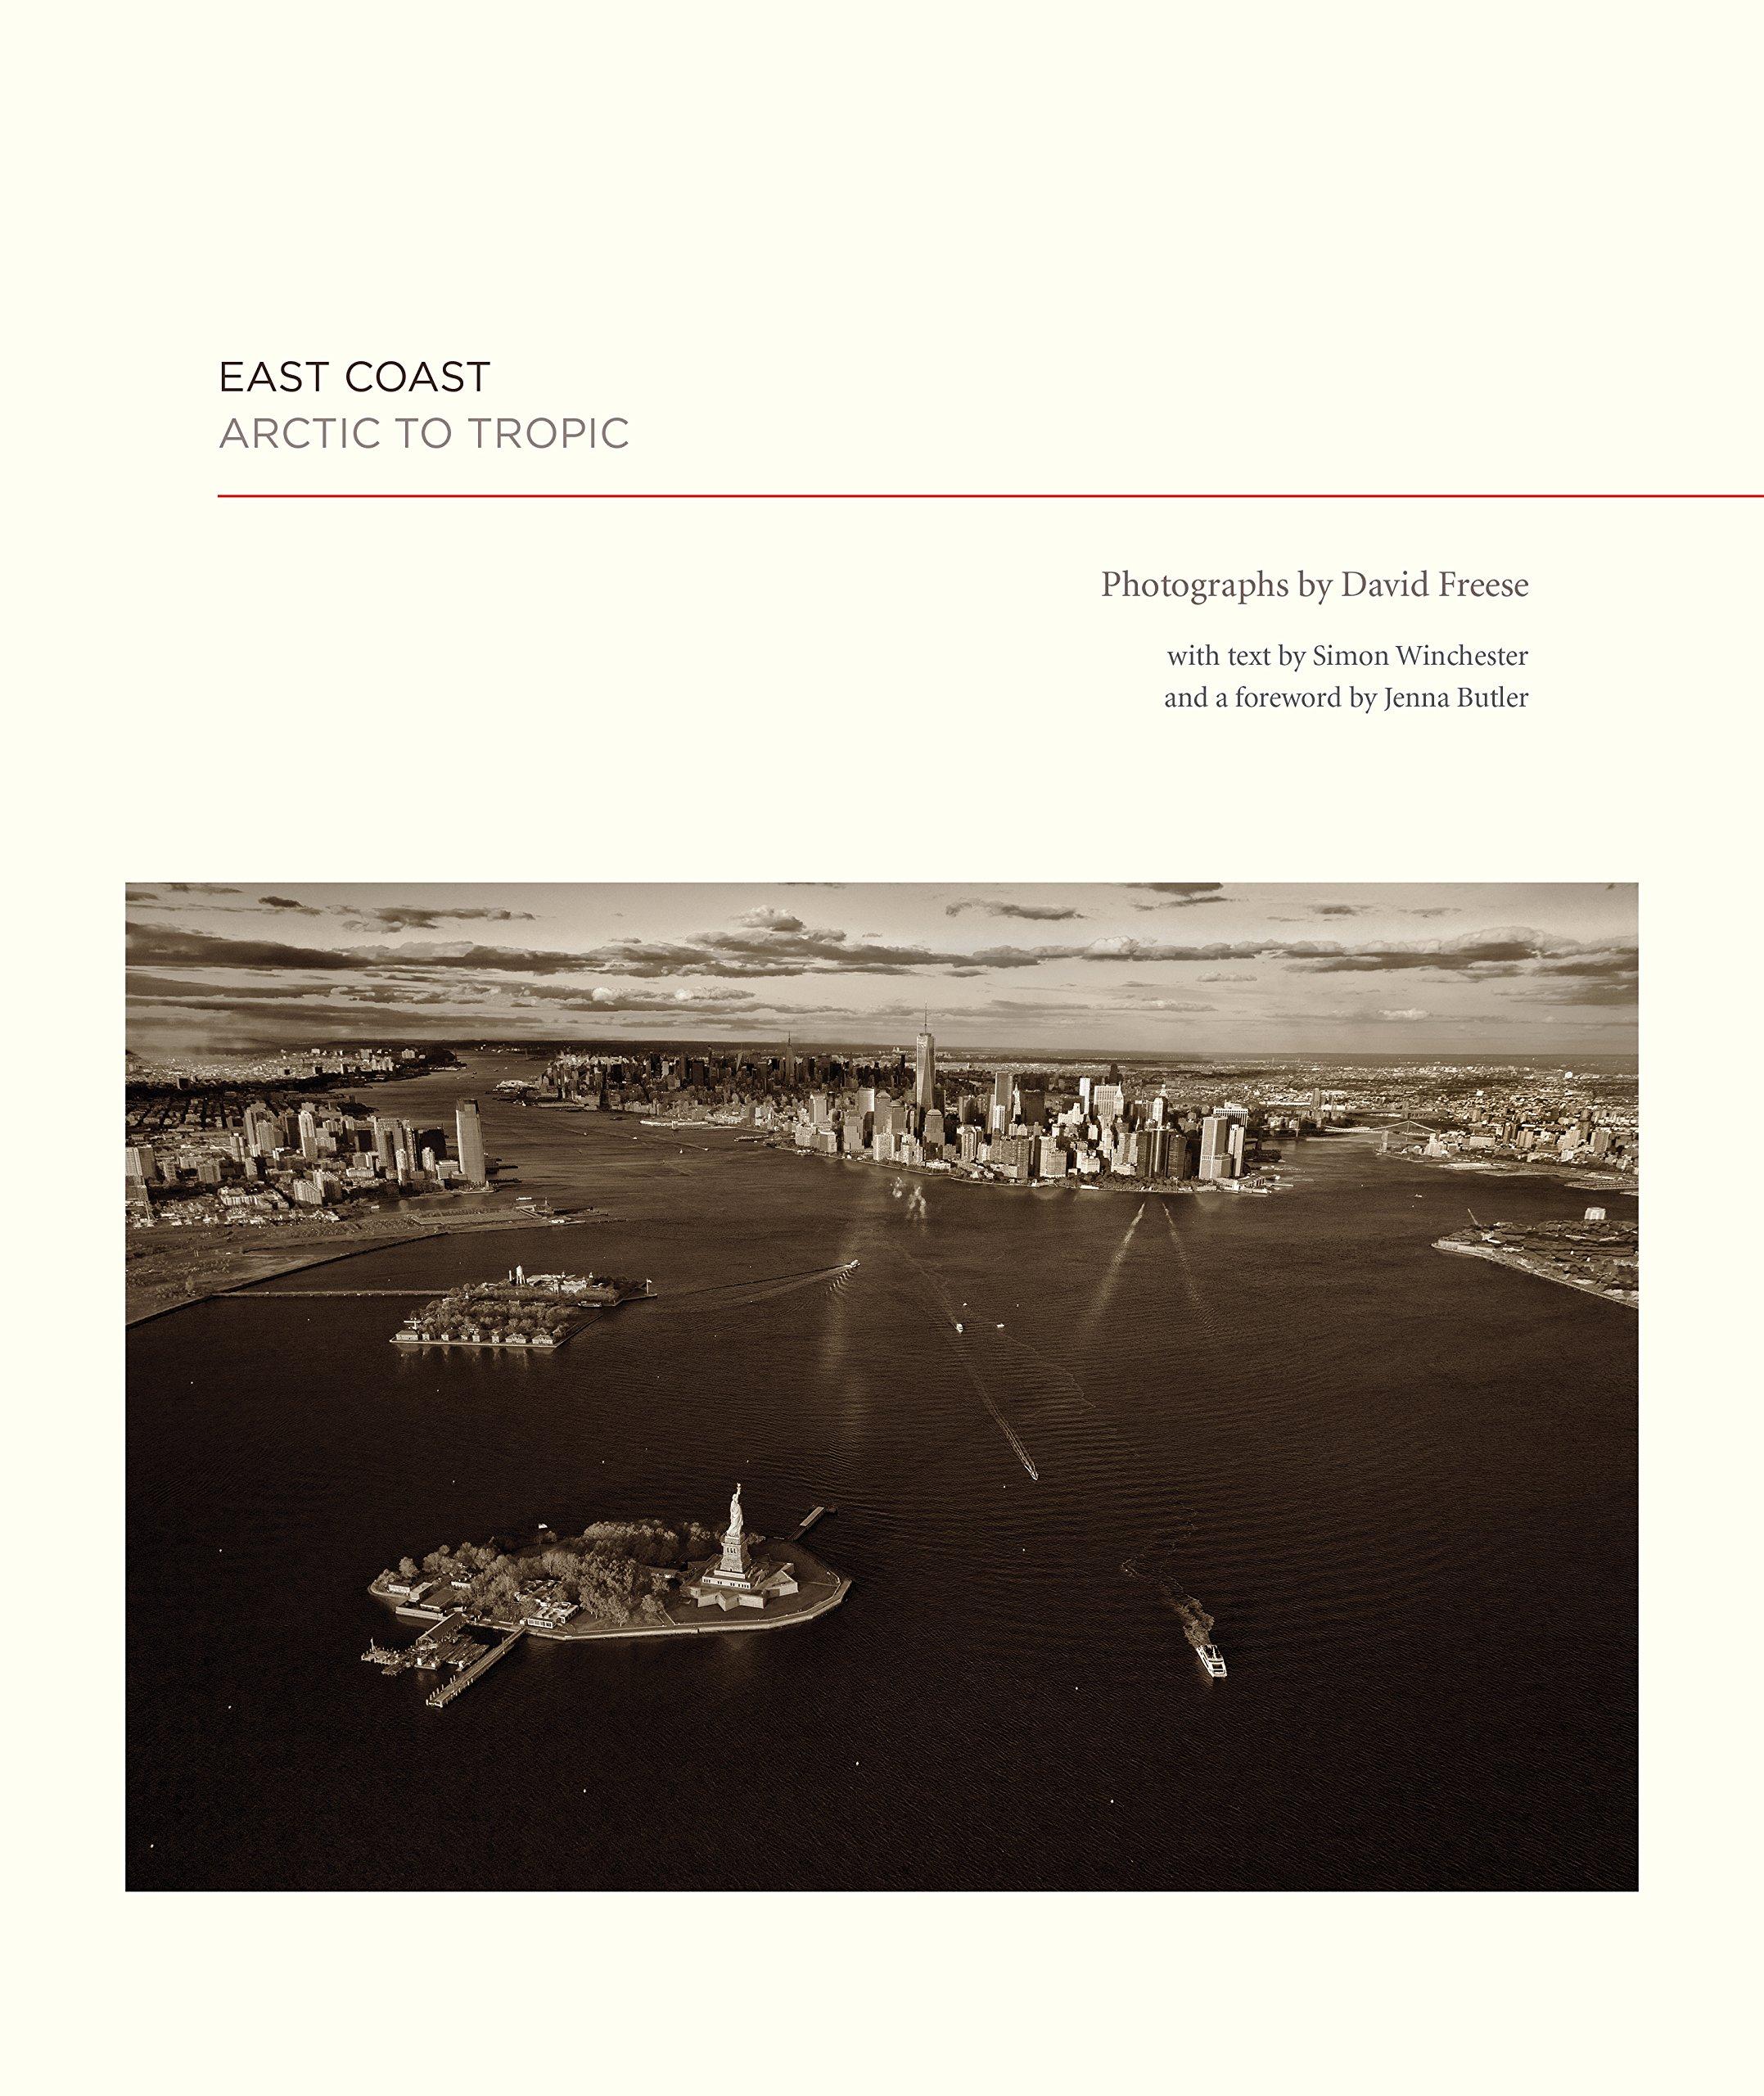 East Coast: Arctic to Tropic